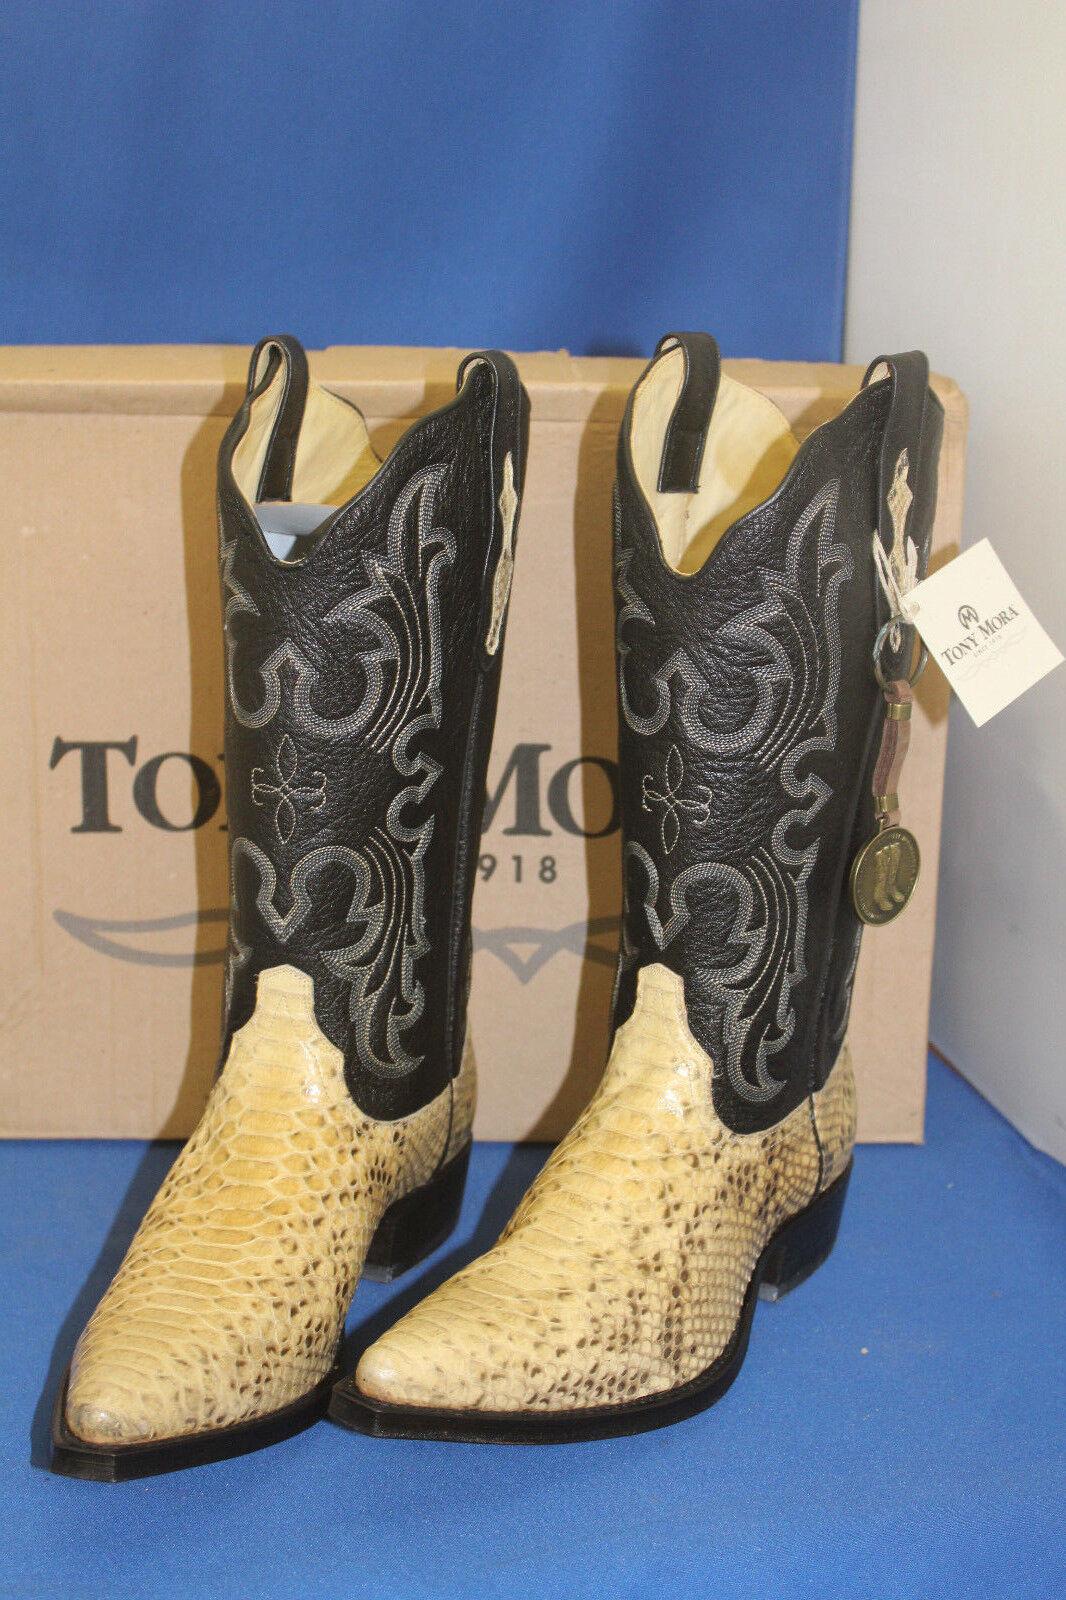 TONY MORA MORA TONY Stiefel Stiefel python  westernstiefel cowboystiefel  gr. 45  neu snake 14d076